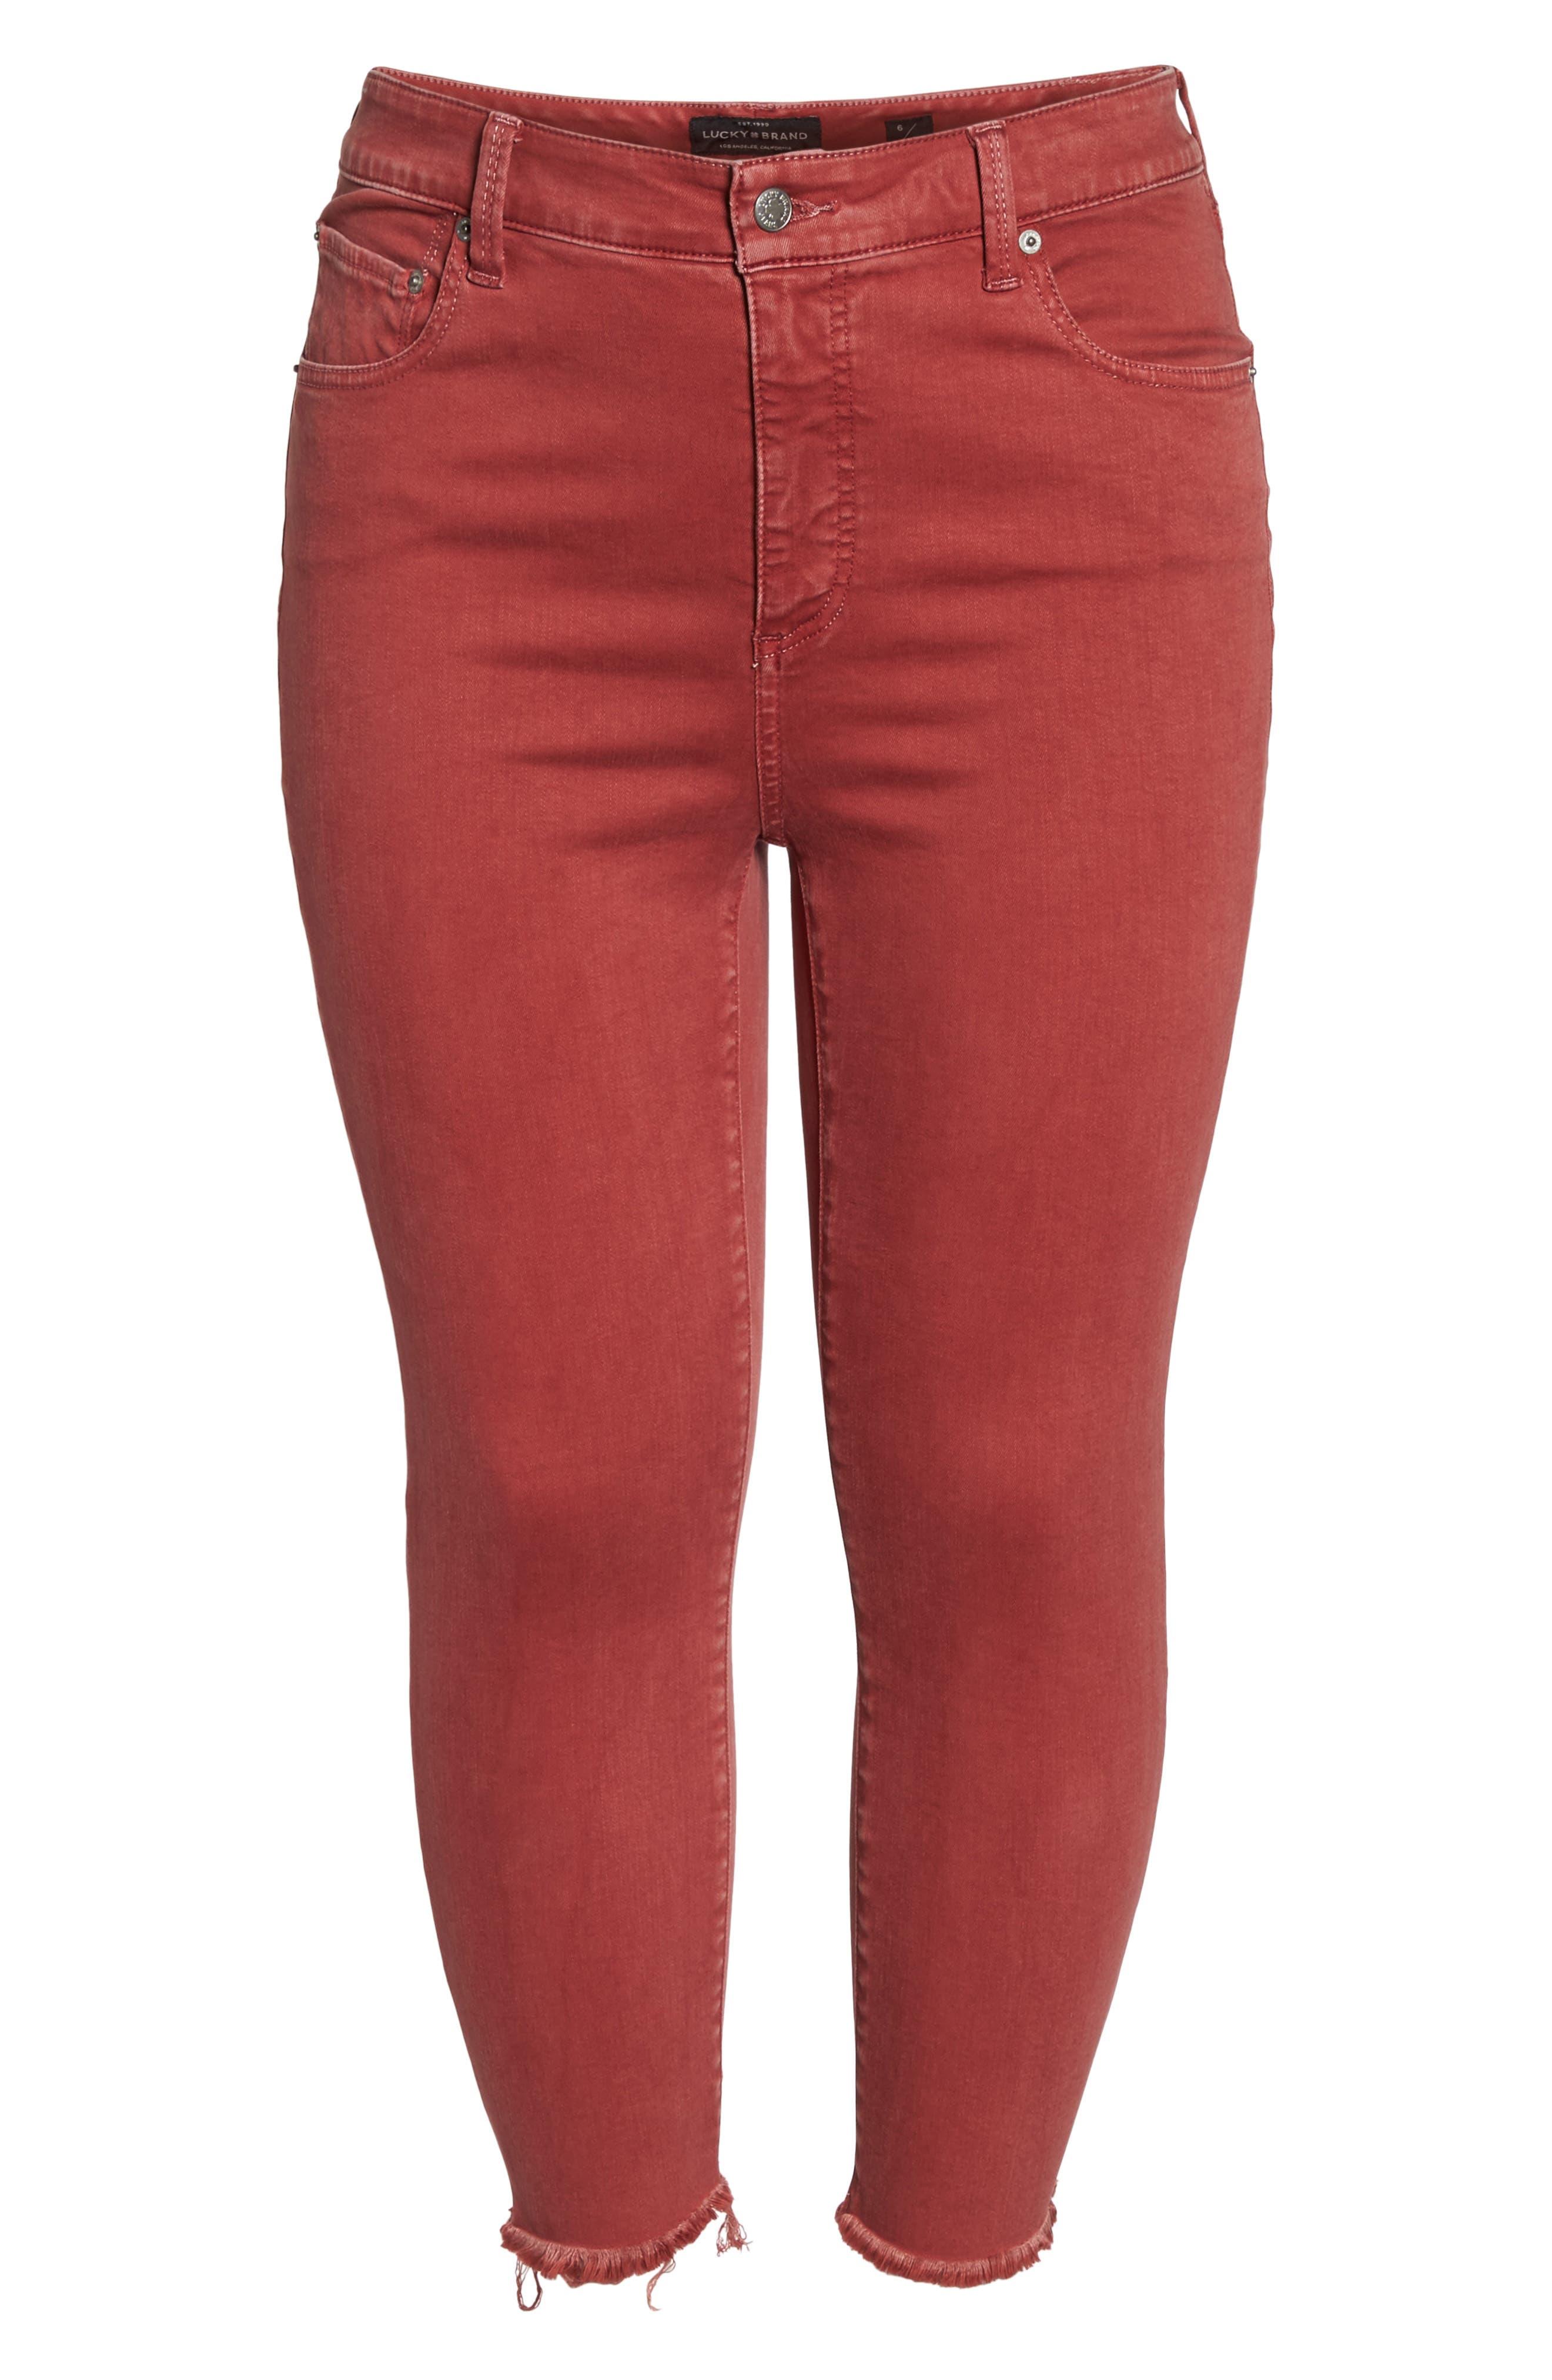 Emma Crop Jeans,                             Alternate thumbnail 7, color,                             La Cara